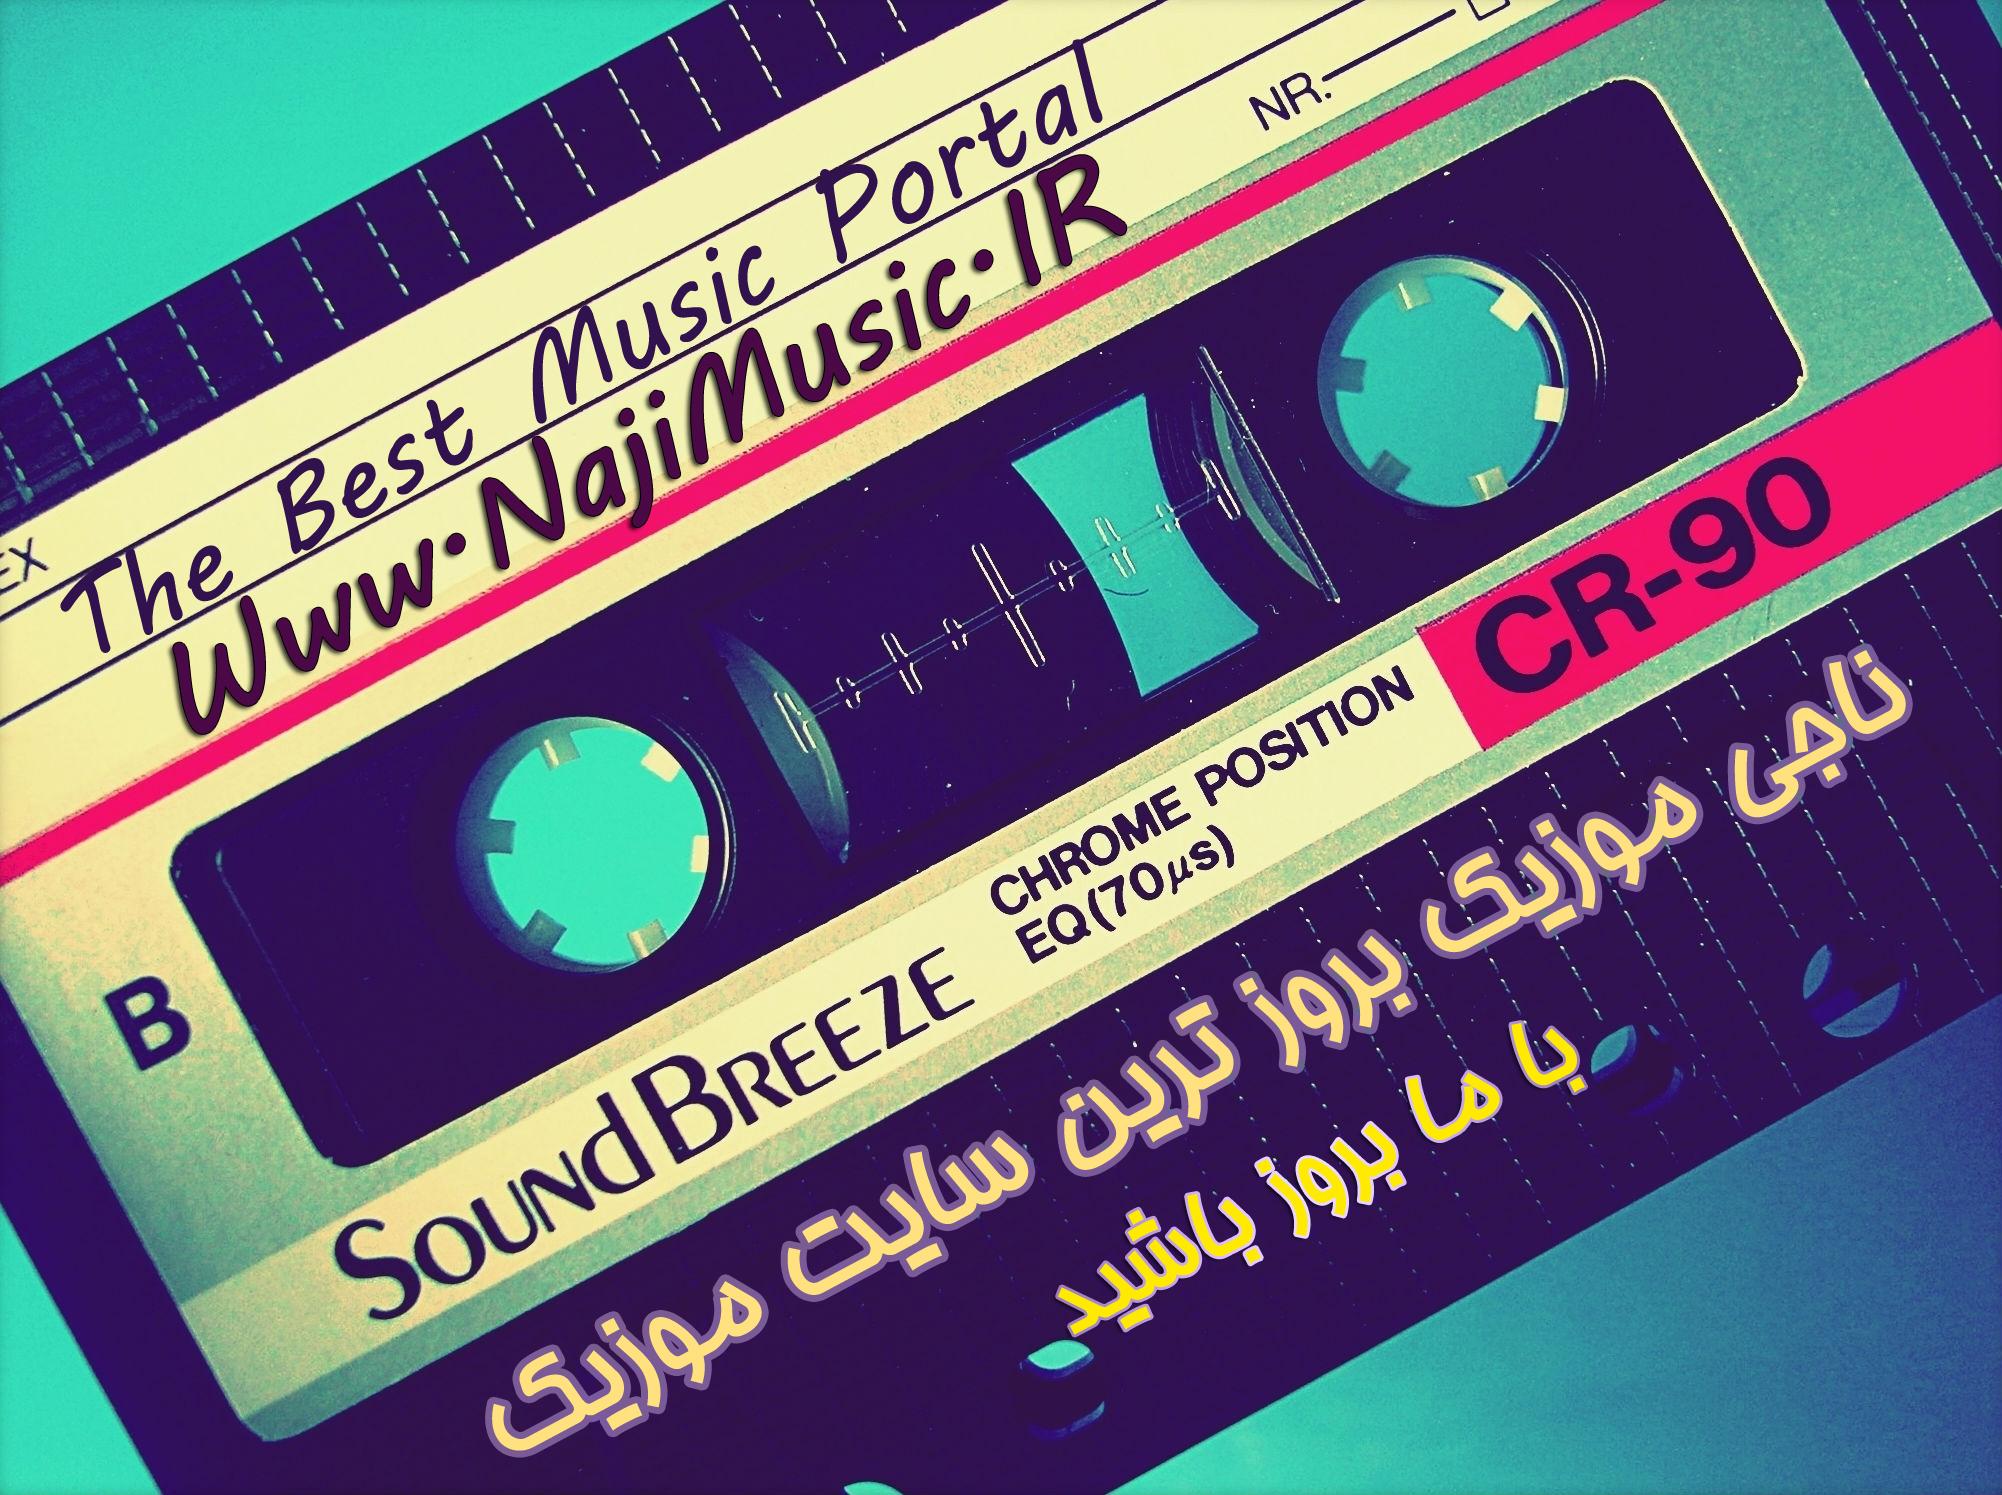 http://naji-music.tk/Music%20Shad/Ali%20Soti/naji1.jpg